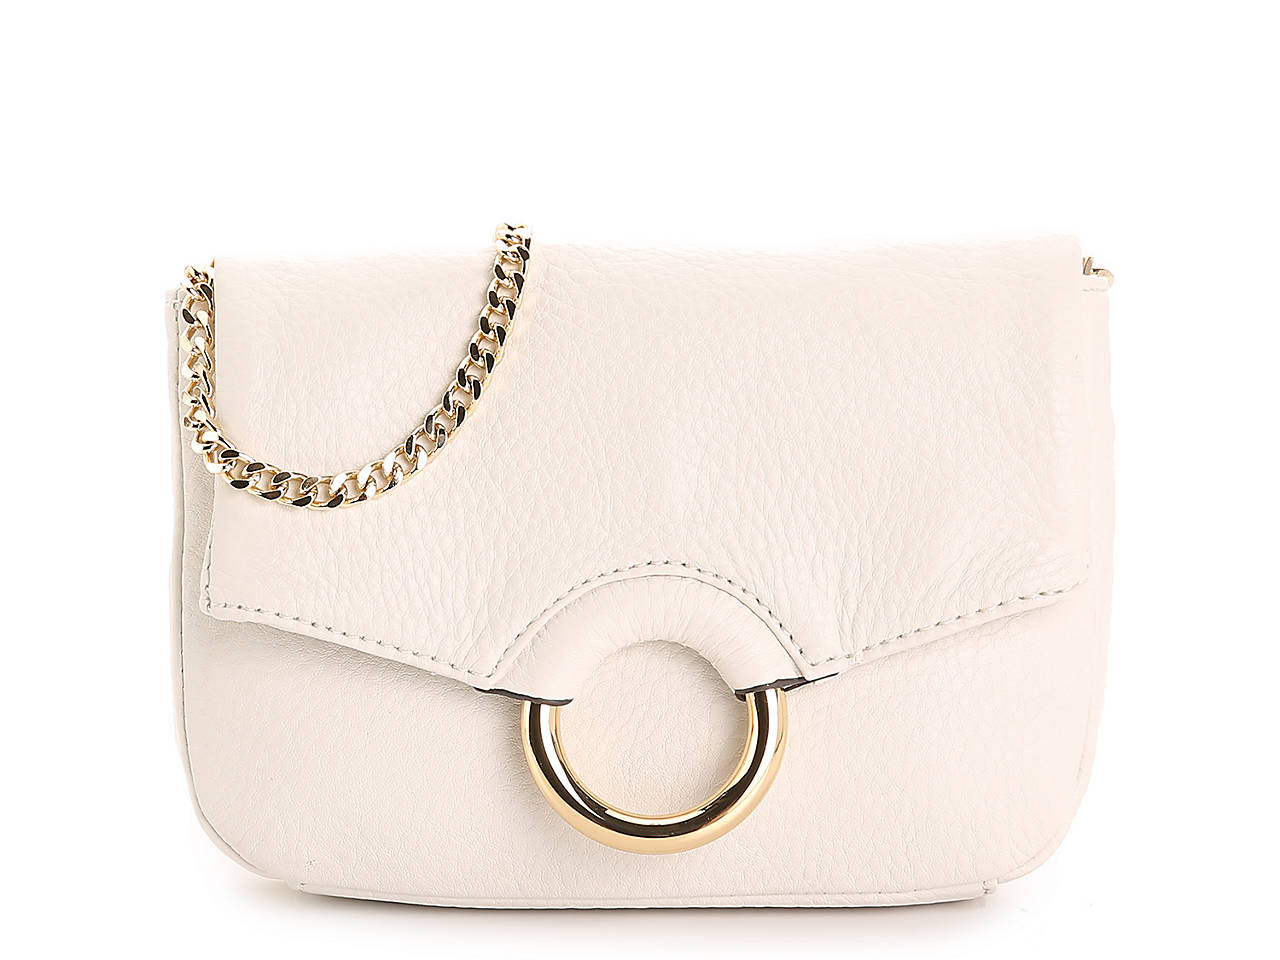 517addae0f74 Vince Camuto Oria Leather Crossbody Bag Women s Handbags ...